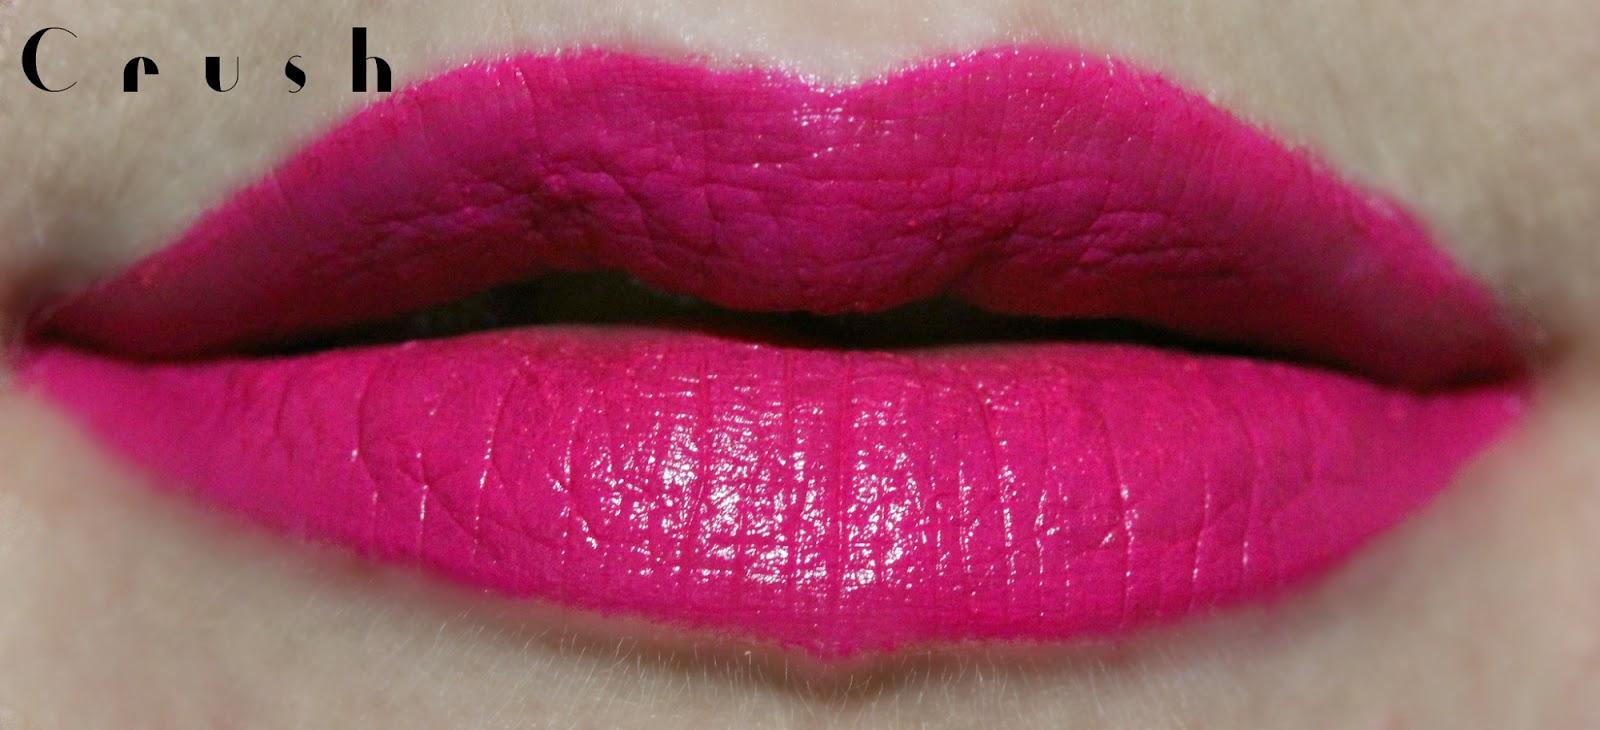 Urban Decay Crush lipstick